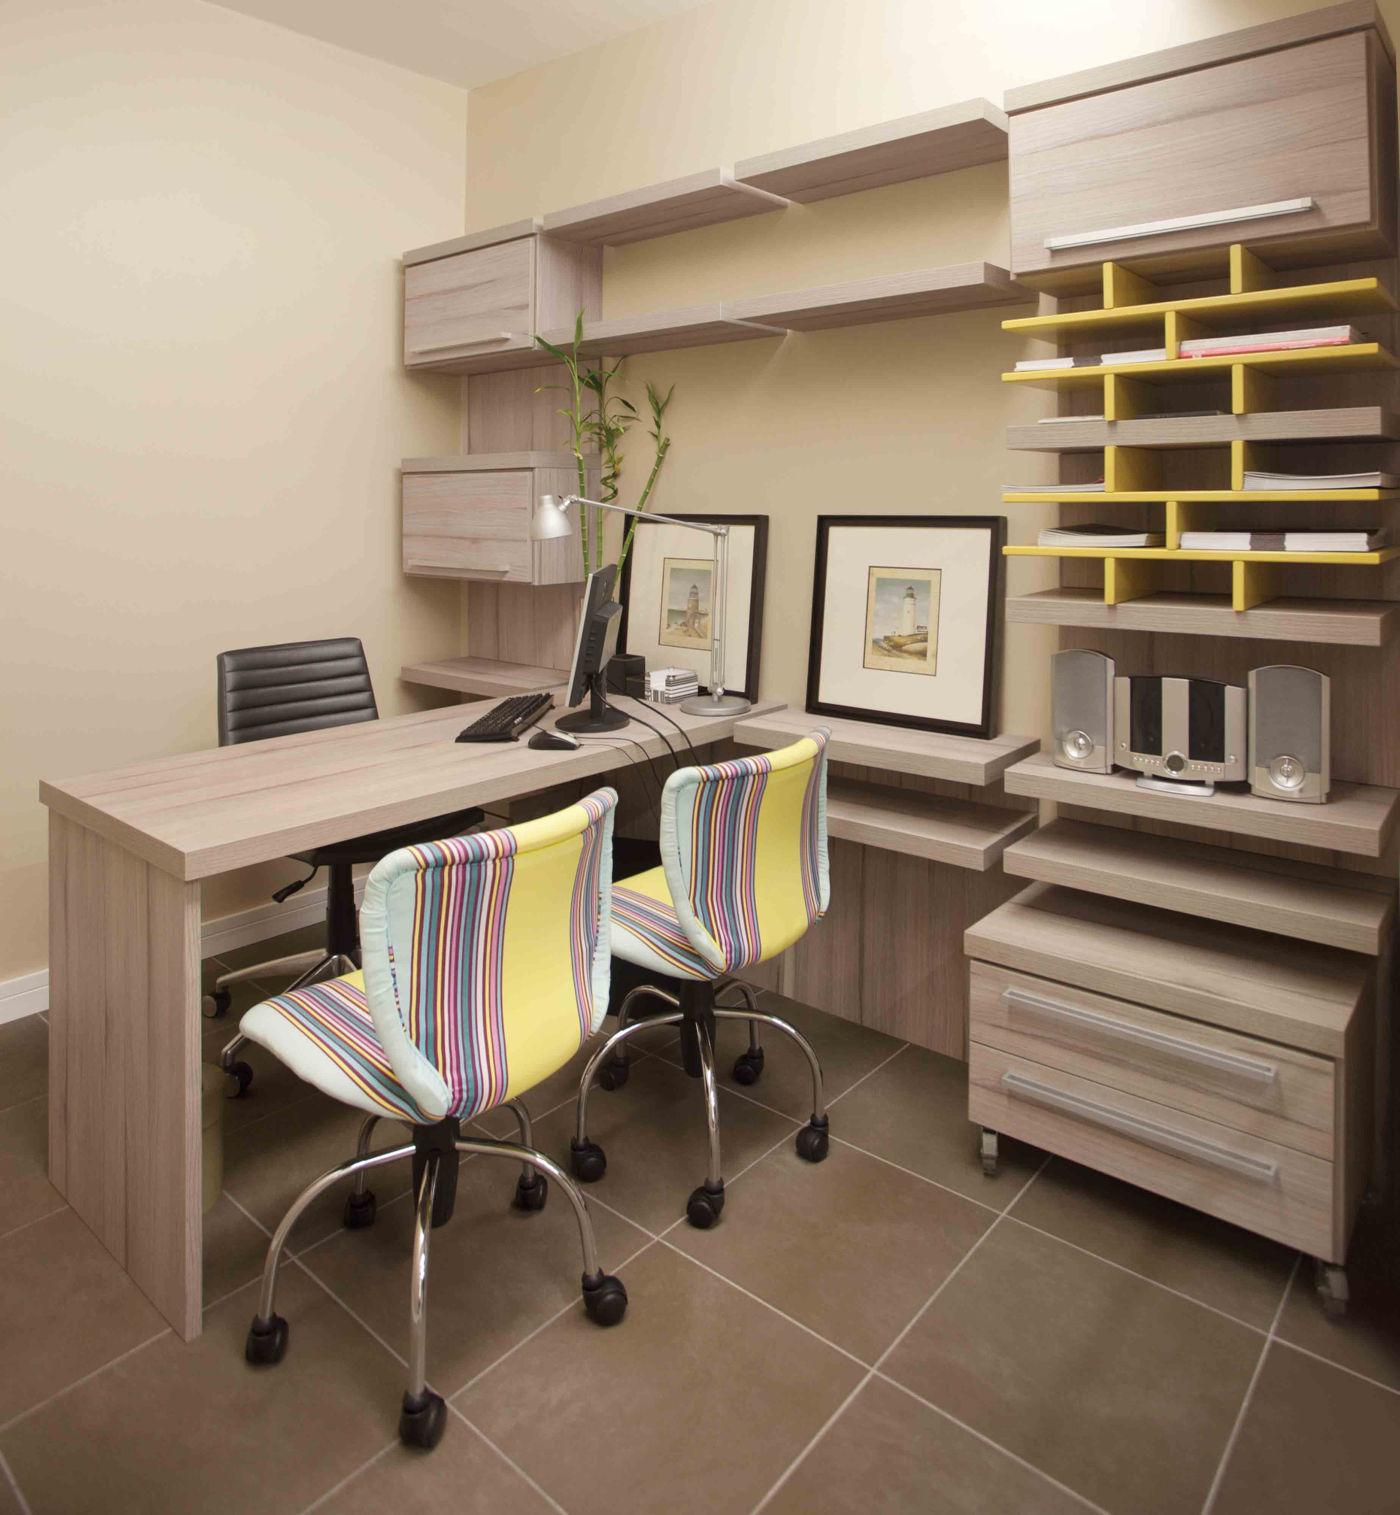 Home Office: Como Compor O Ambiente?